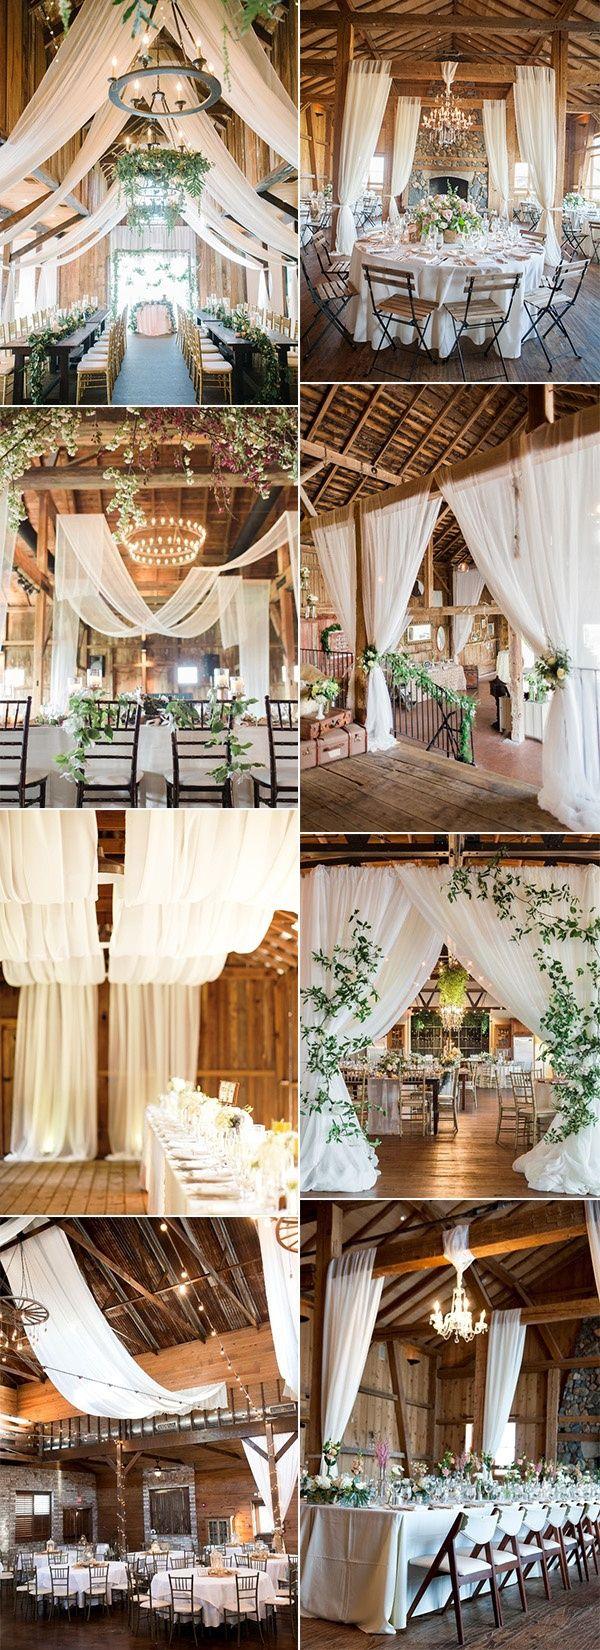 Trending-20 Brilliant Wedding Reception Ideas with Draped Fabric for 2019 - Page 2 of 2 -   17 wedding Barn diy ideas